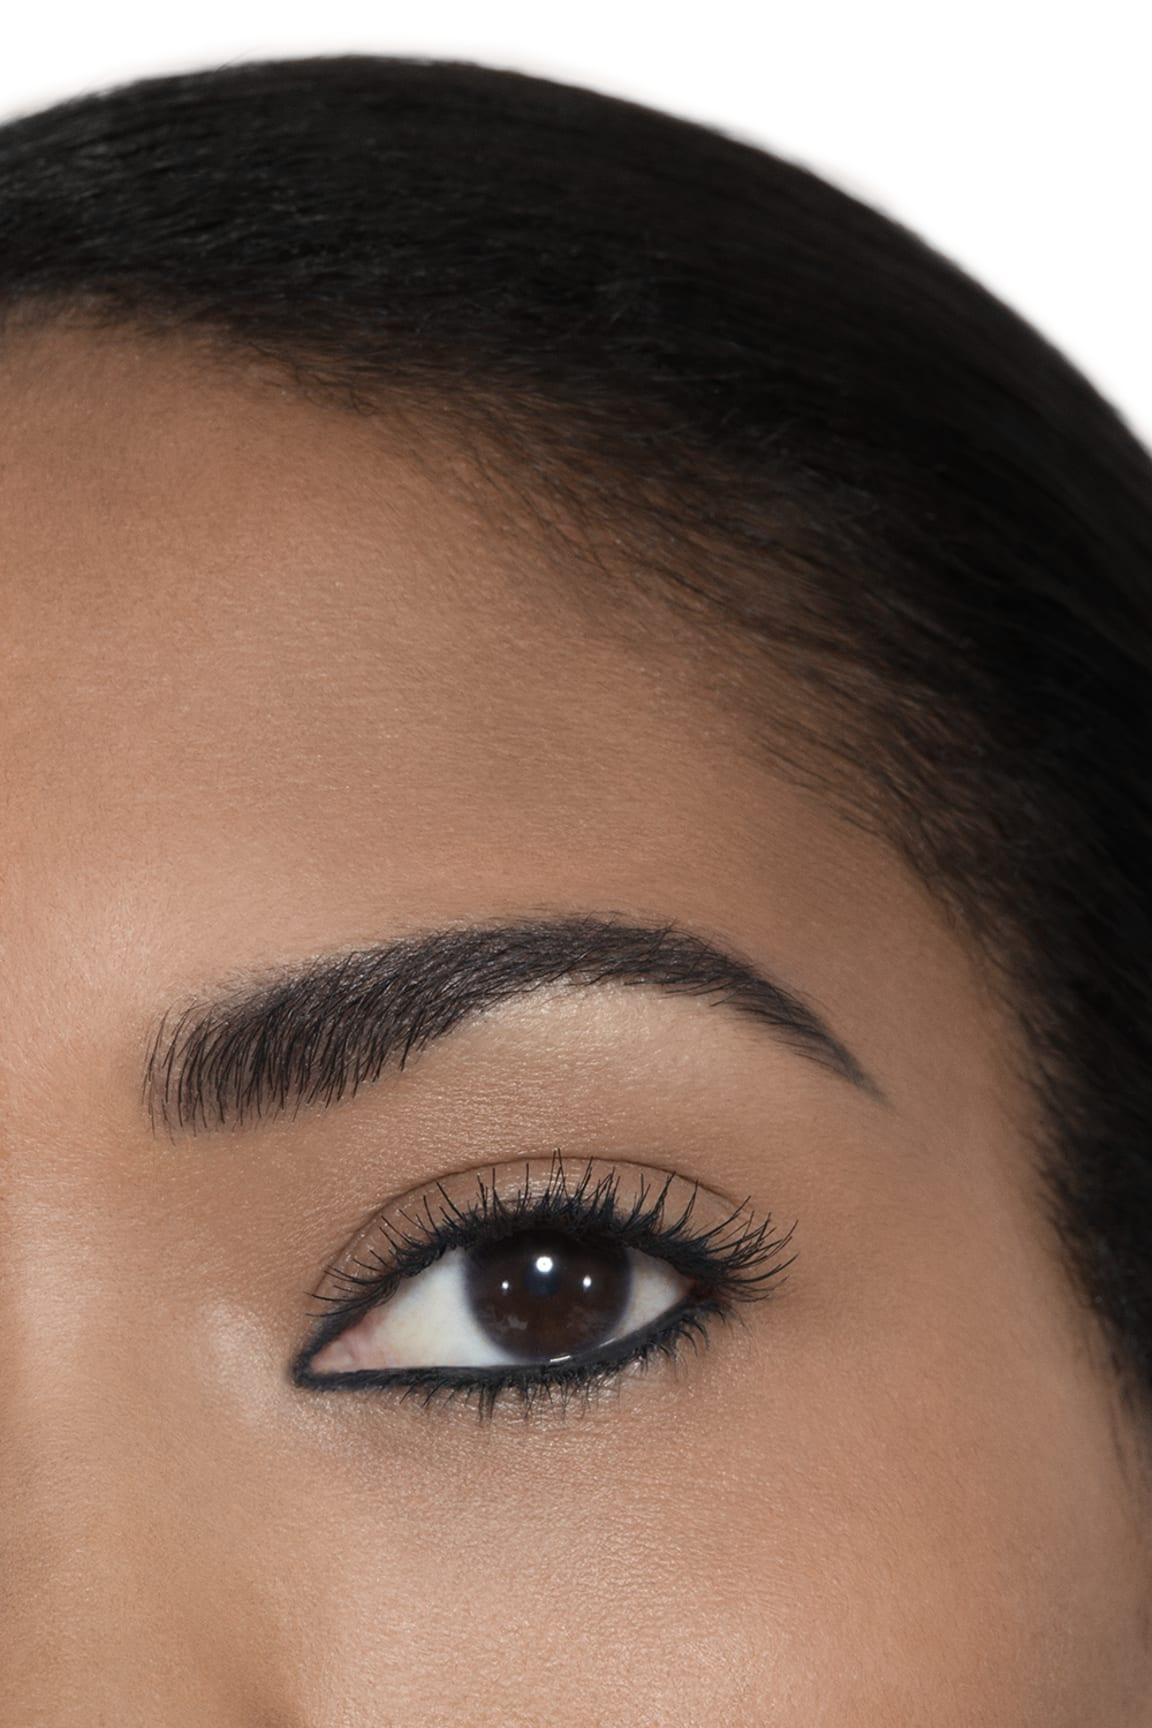 Application makeup visual 2 - LE CRAYON KHÔL 61 - NOIR